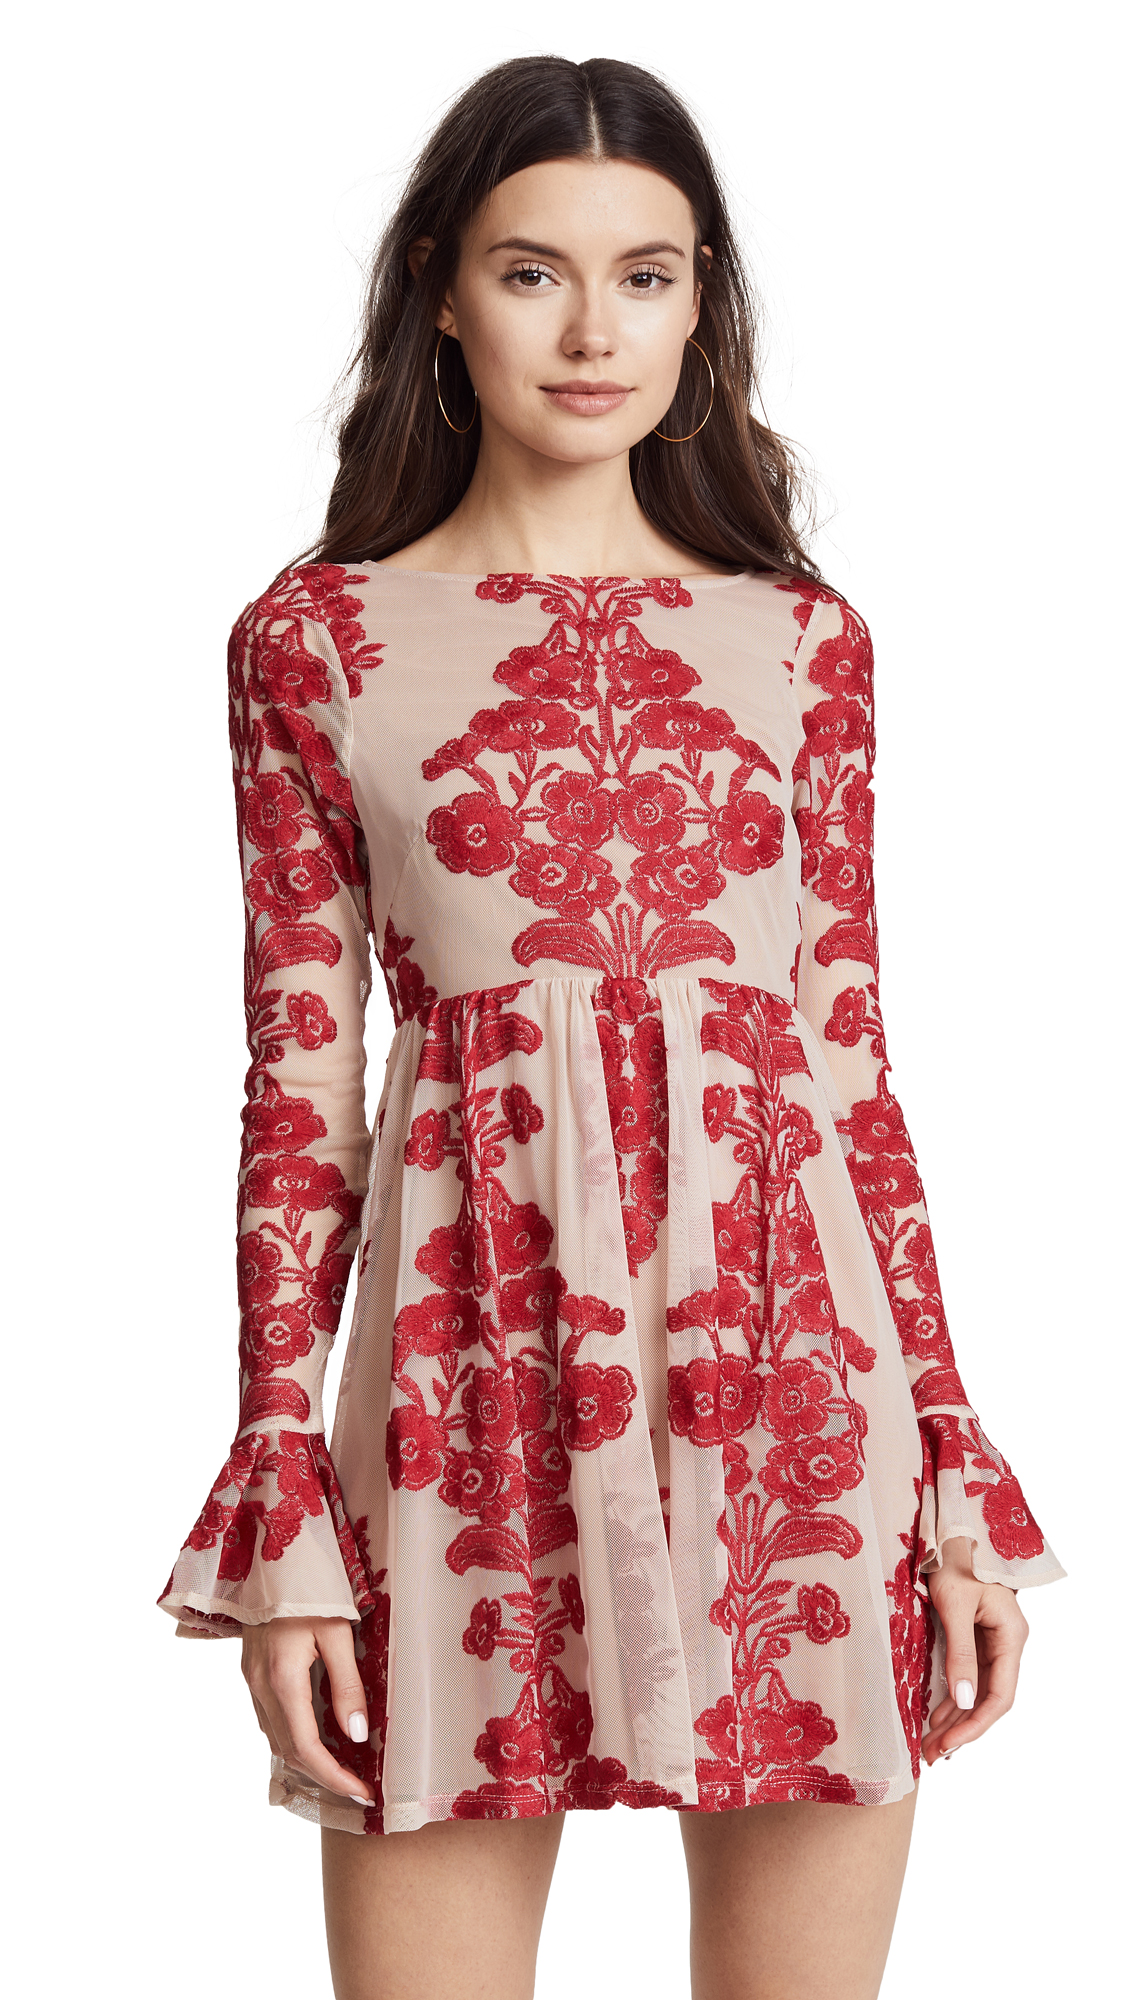 For Love & Lemons Temecula Mini Dress - Red